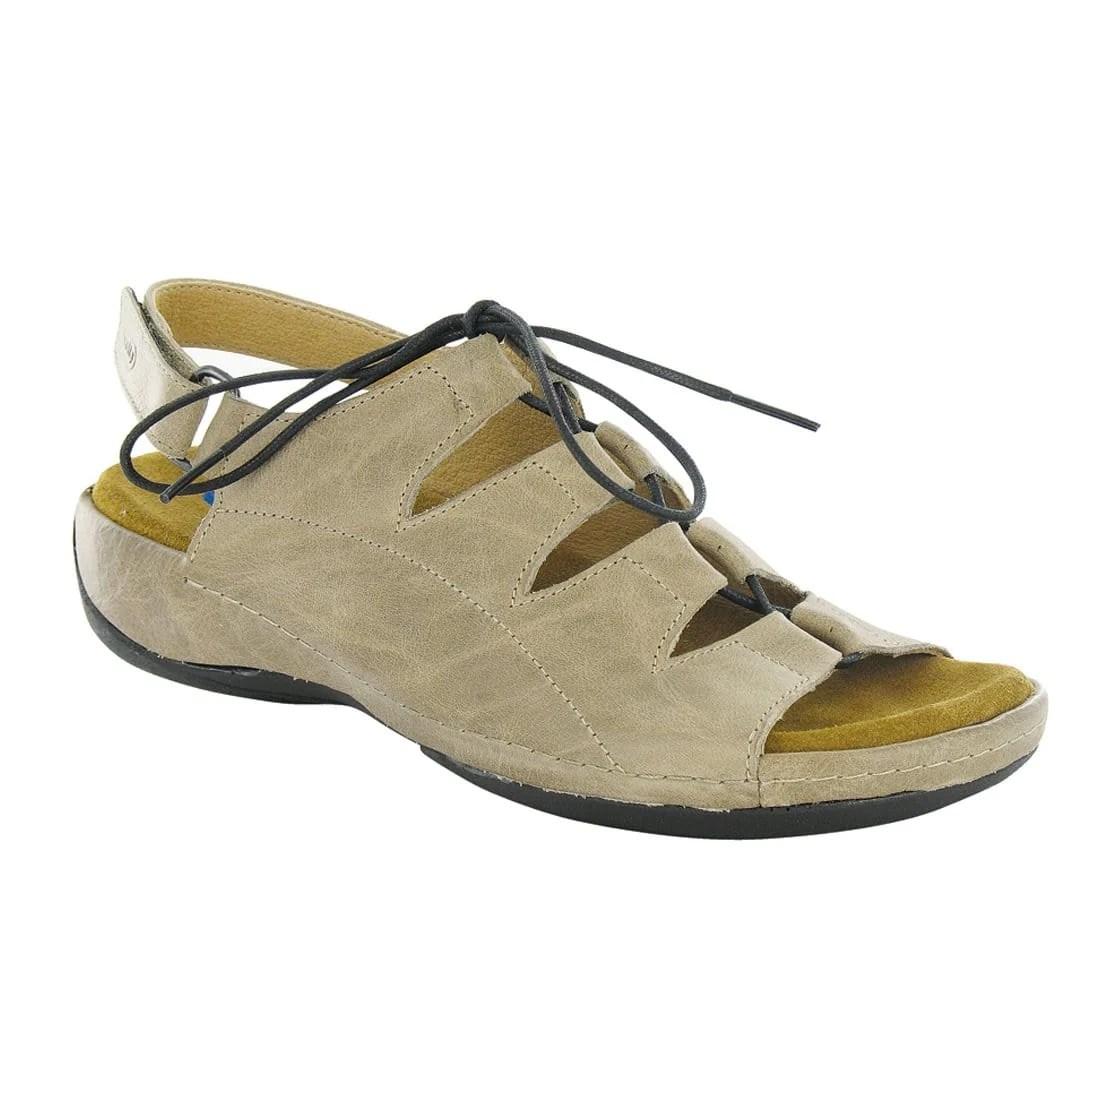 Wolky Kite 0310 Women' Leather Memory Foam Ghillie Sandal Simons Shoes